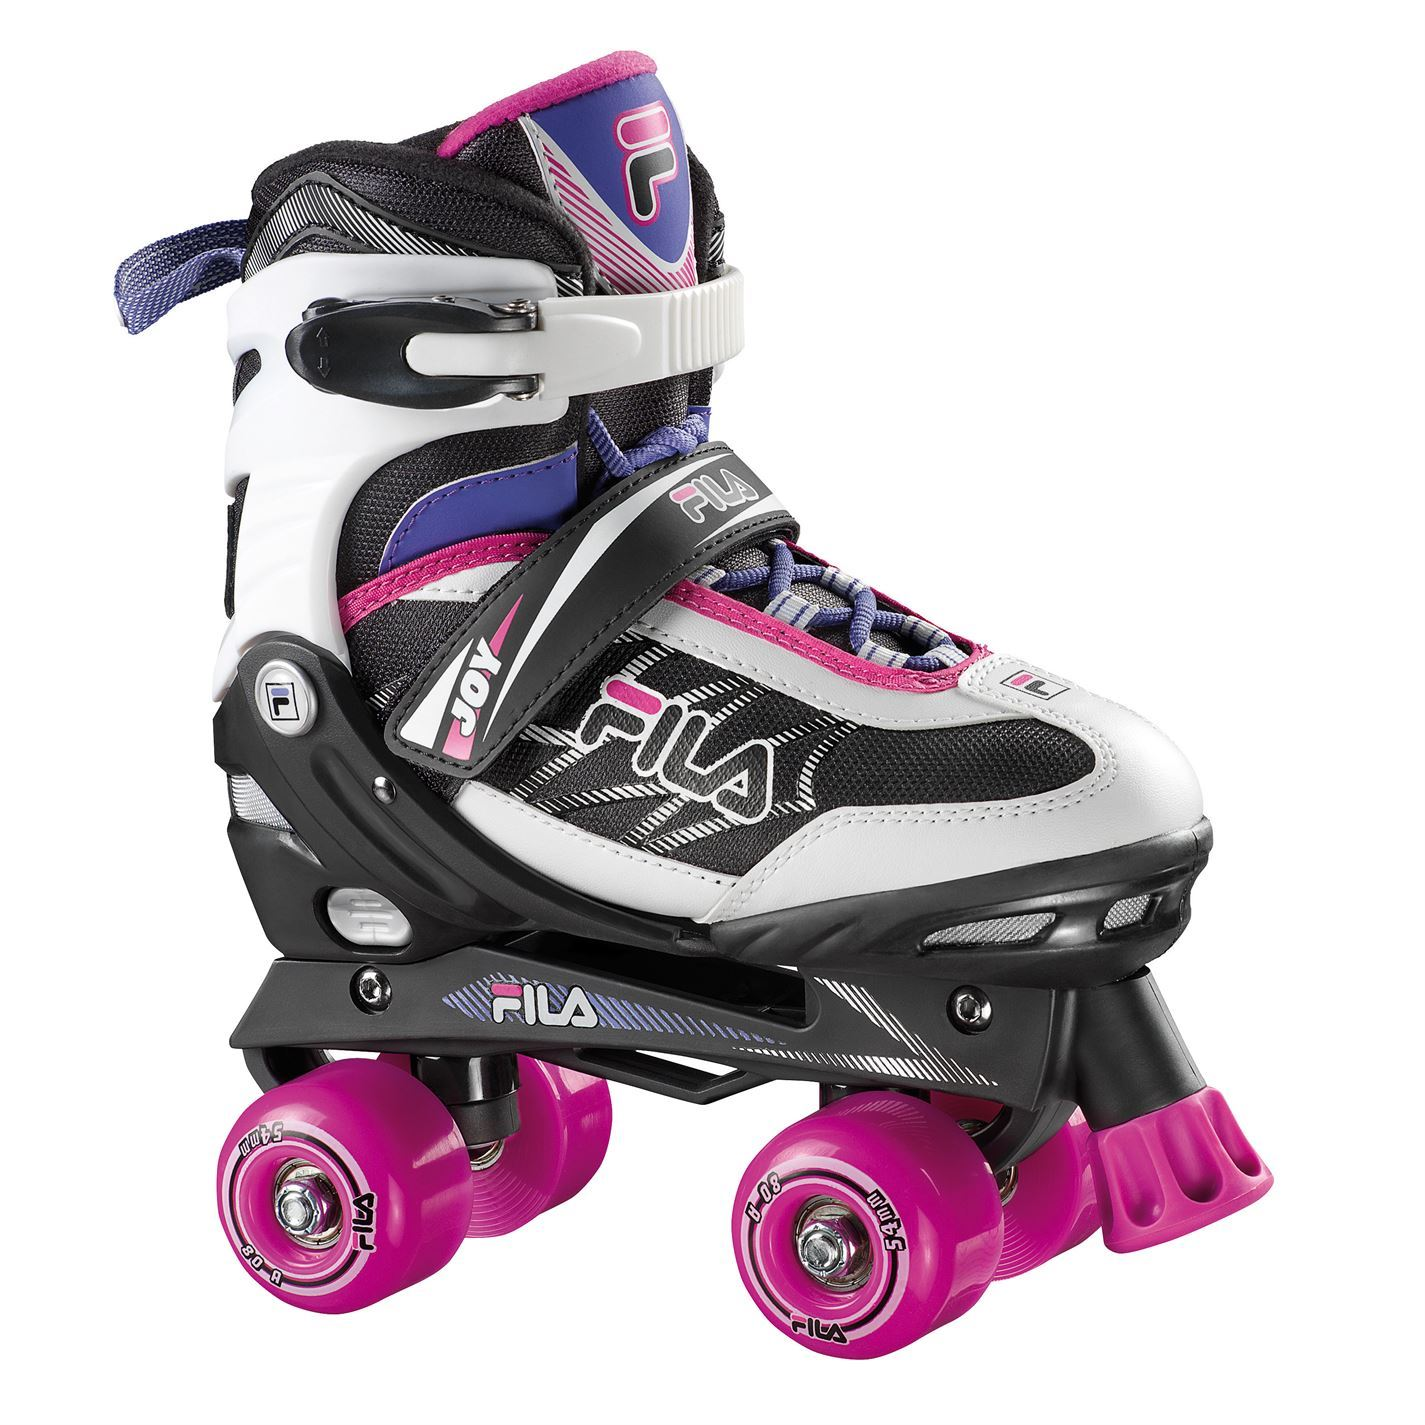 Fila-Kids-Joy-Quad-Skates-Girls-Wheeled-Roller-Shoes